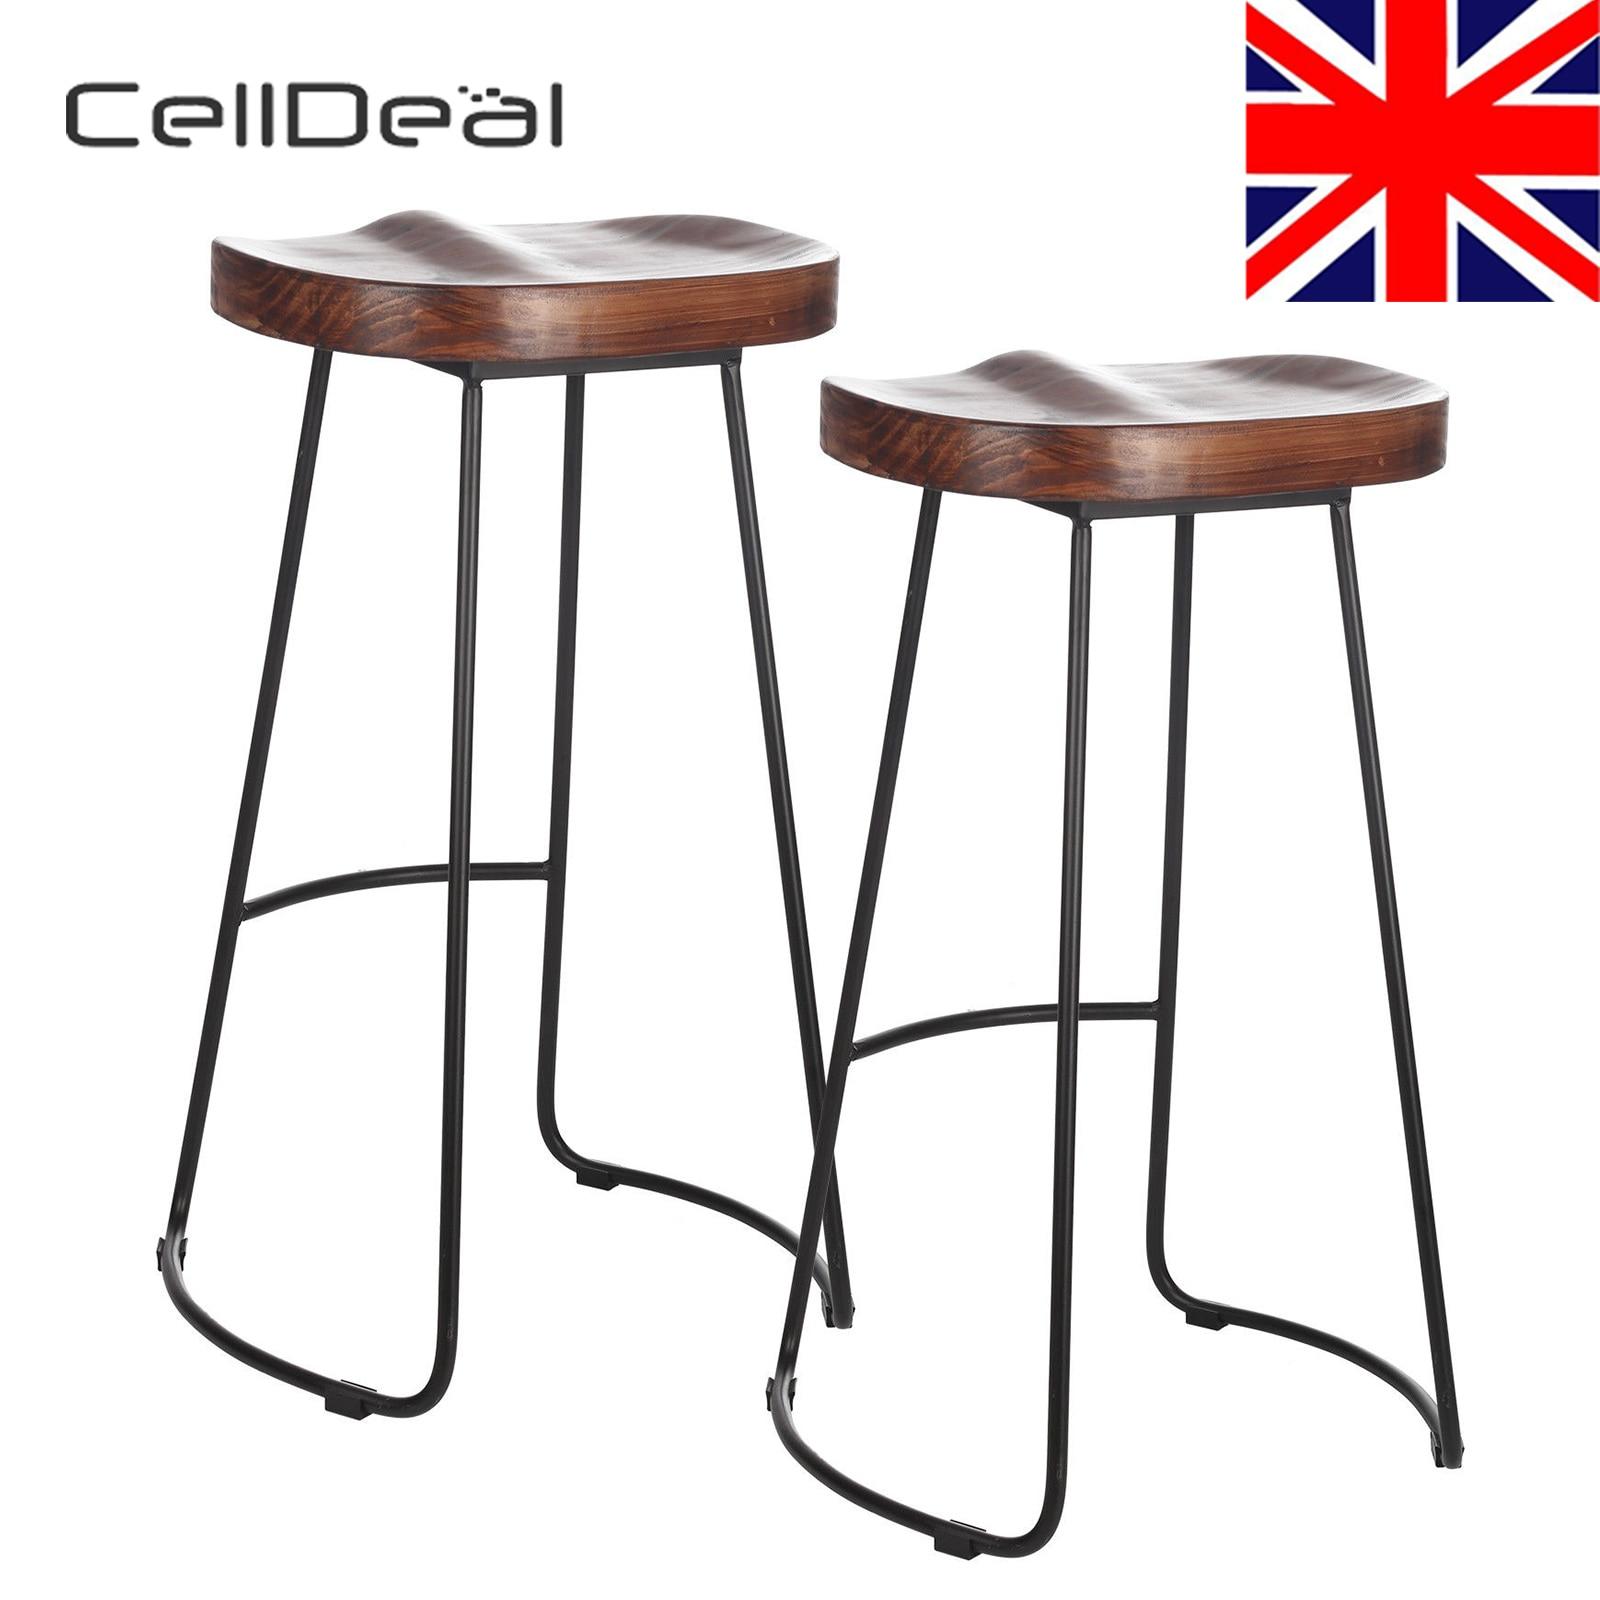 Surprising Set Of 2 Industrial Bar Stools Kitchen Breakfast High Chair Machost Co Dining Chair Design Ideas Machostcouk